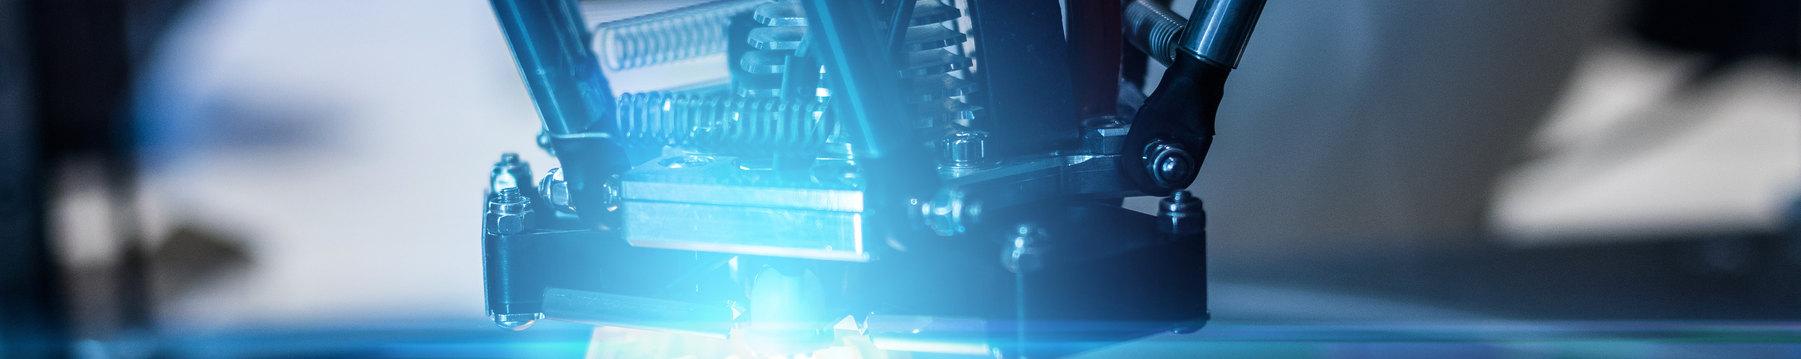 RHYTHM3D-3Dprinting.jpeg